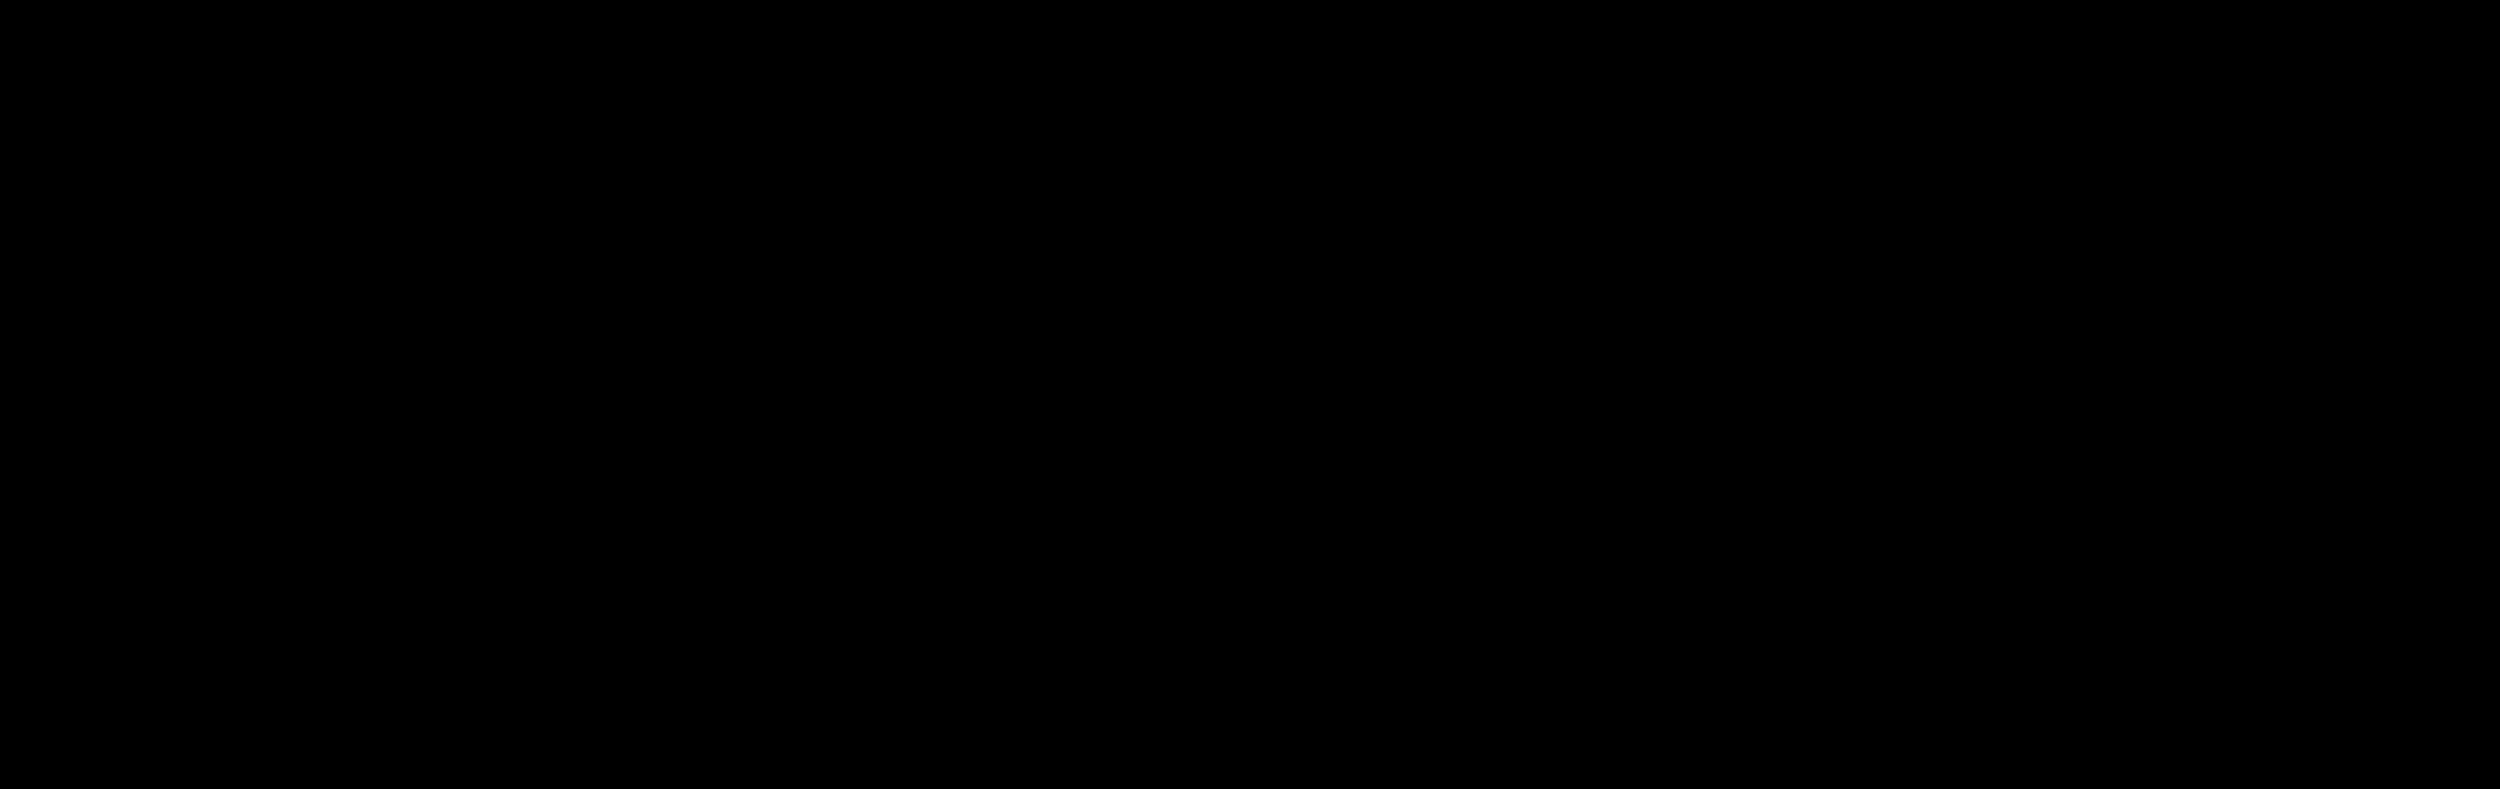 od-horizontal-lockup-black.png